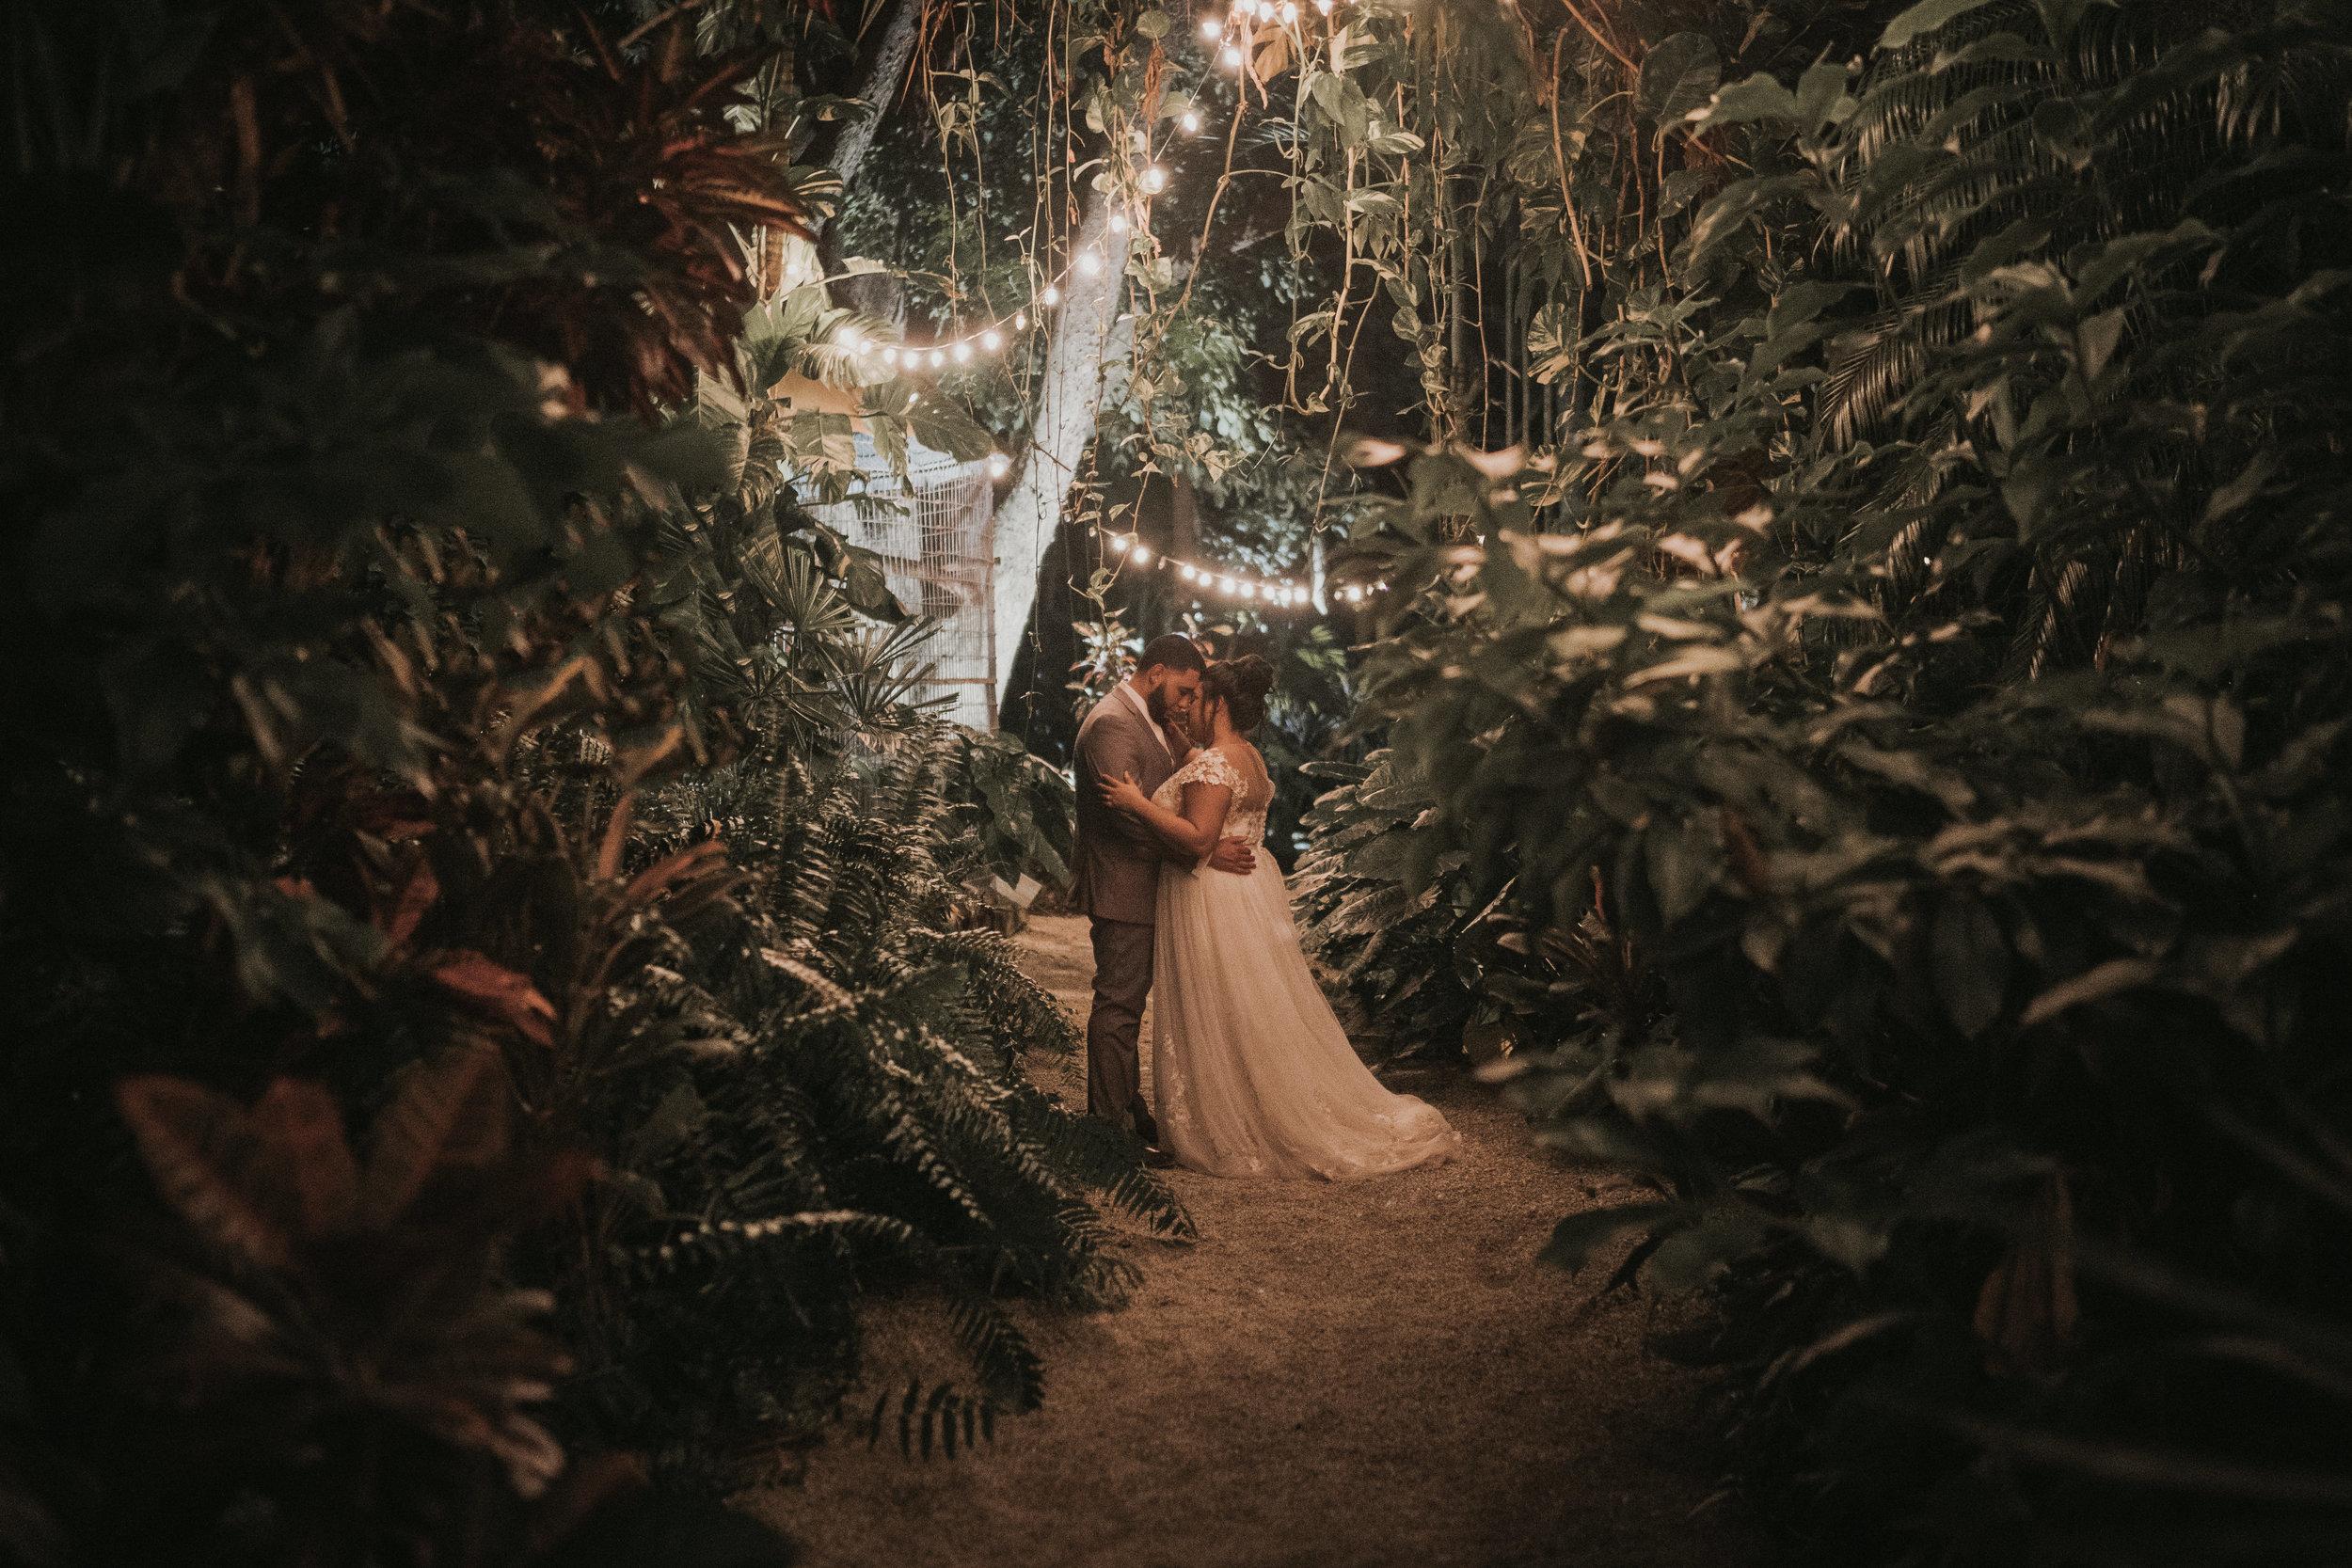 515MICHI&GABEWEDDINGDAY(WeddingFinal).jpg